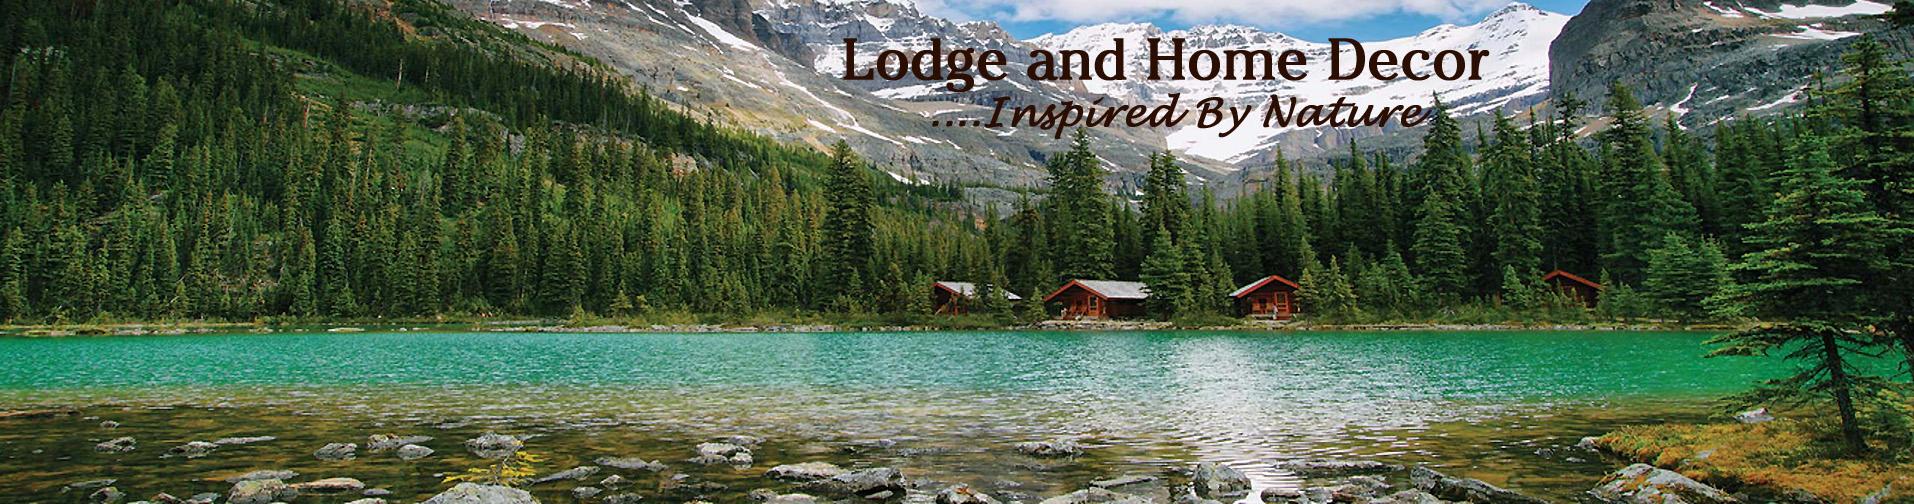 Sonoma Gifts Lodge & Home Decor